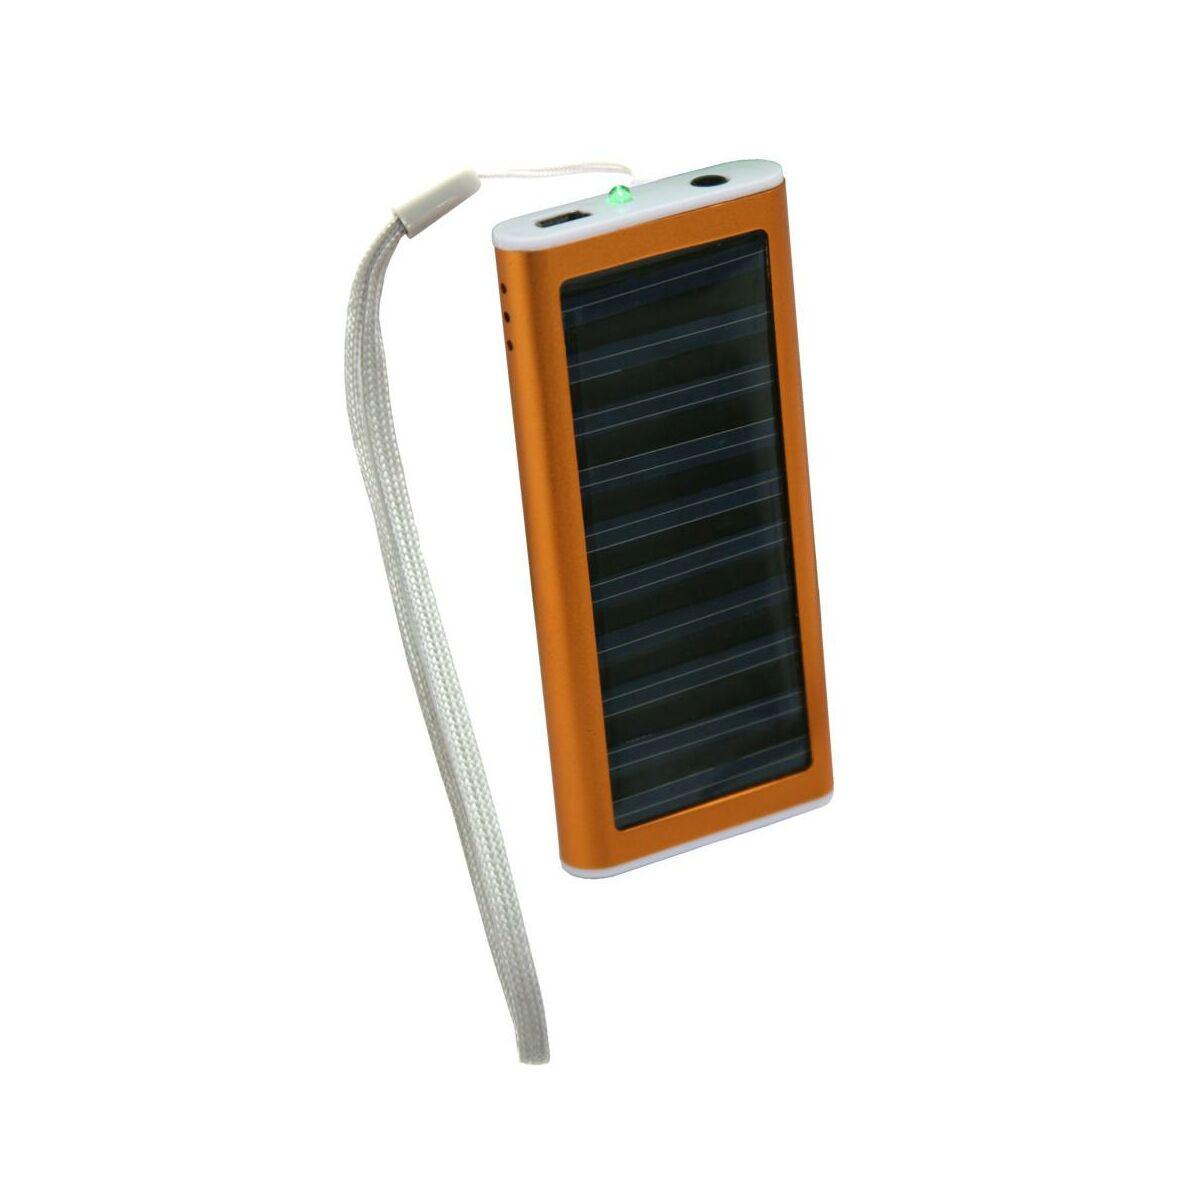 Adowarka solarna fc102 terdens adowarki w - Guirnalda solar leroy merlin ...